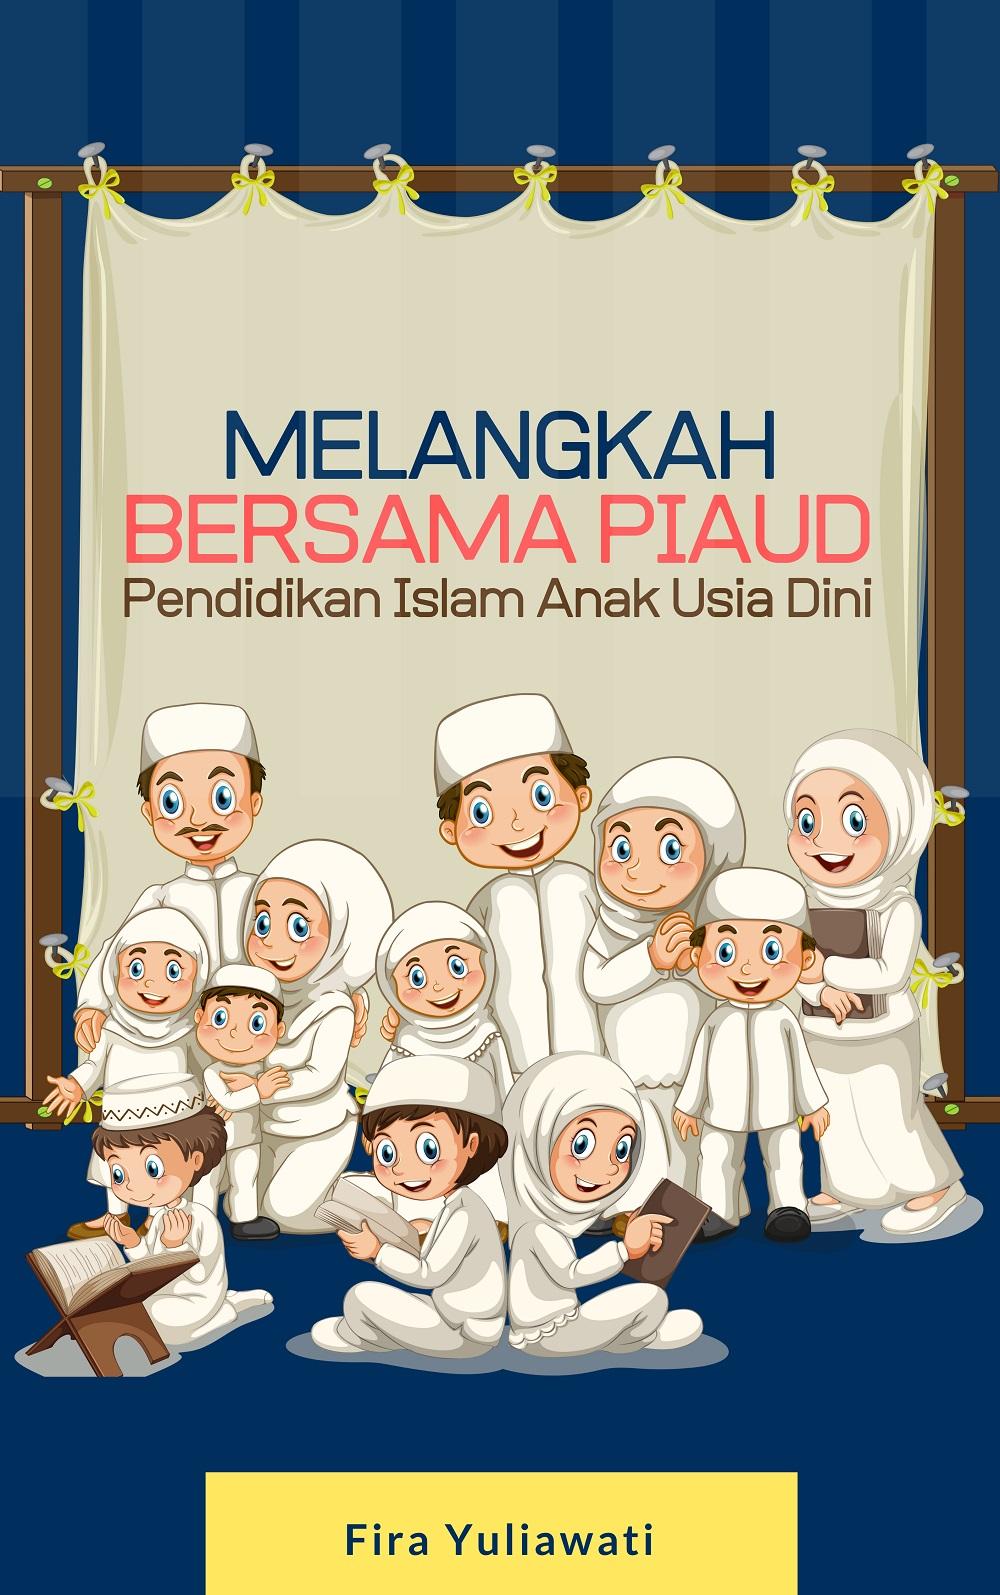 Melangkah bersama PIAUD (pendidikan Islam anak usia dini) [sumber elektronis]